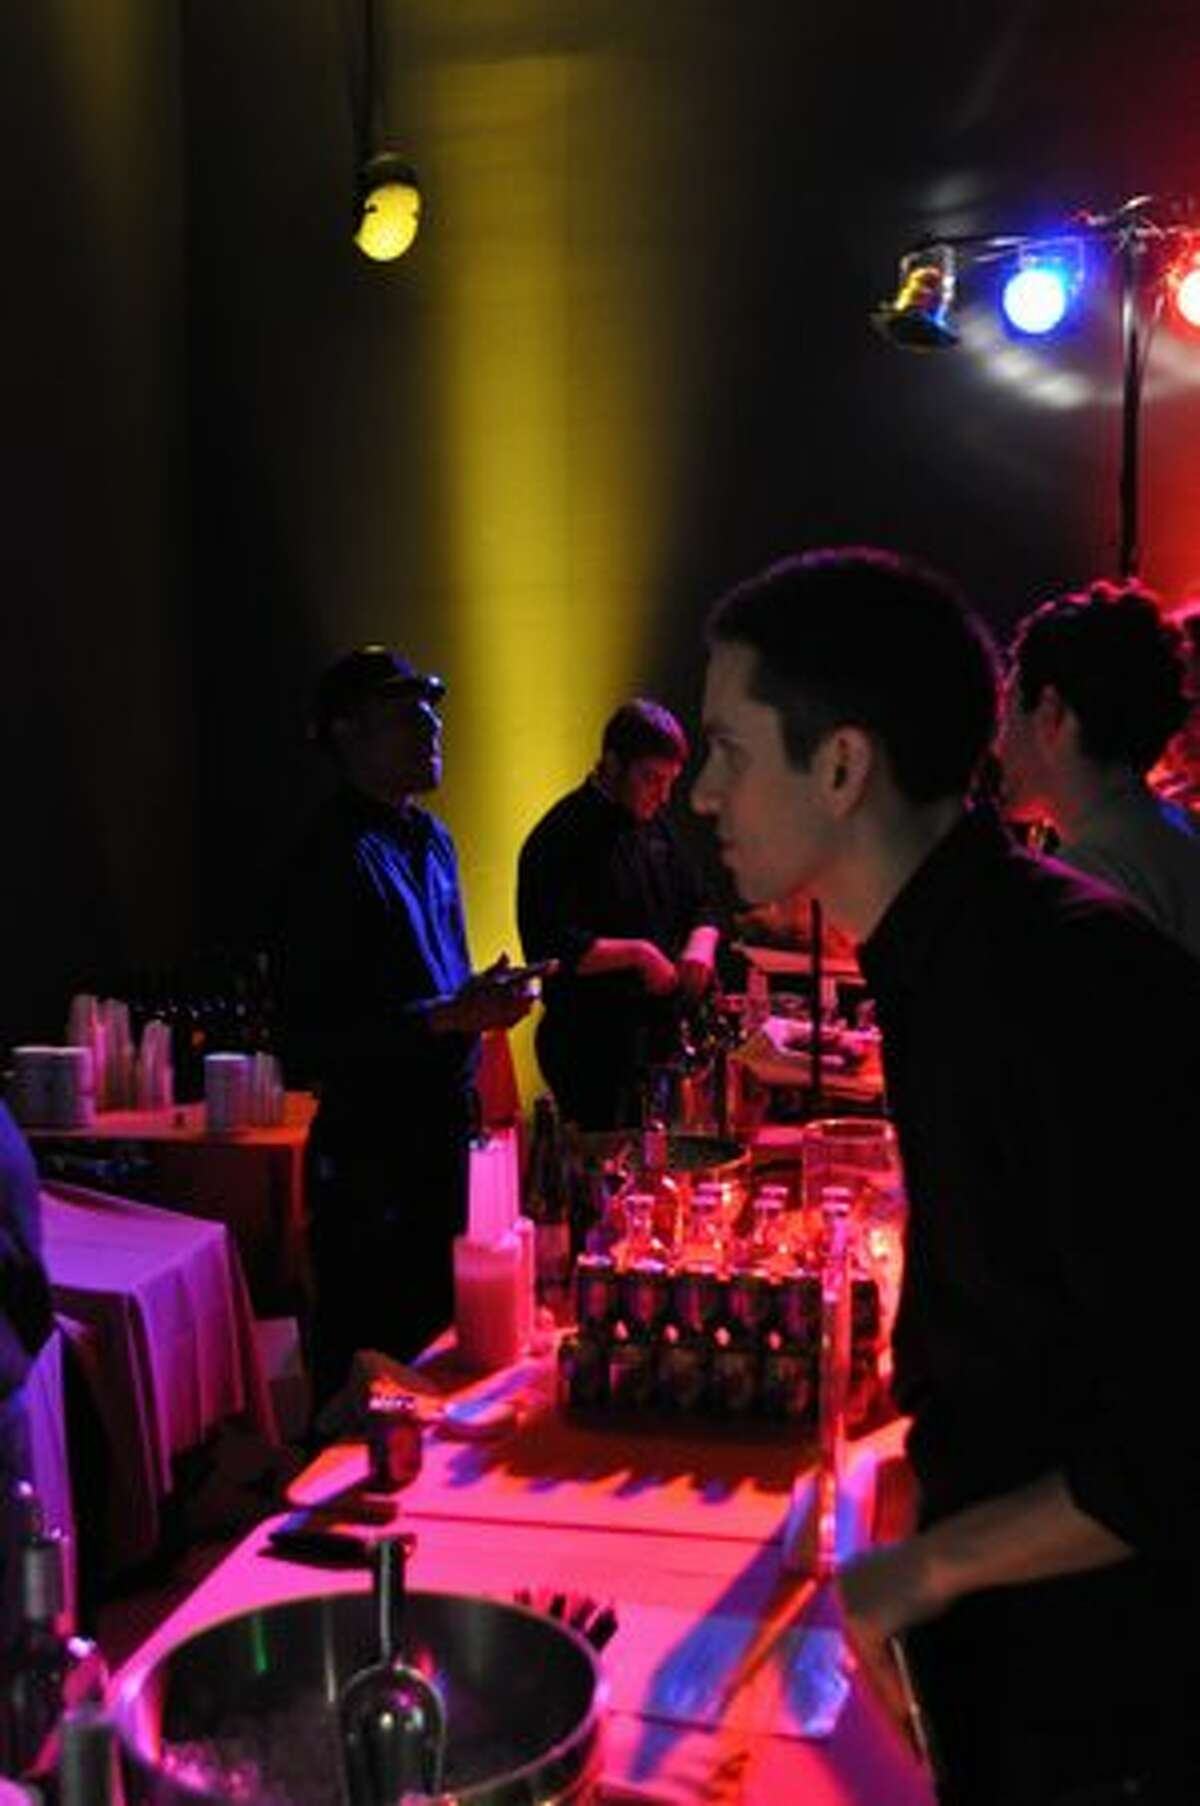 The bar at the SAM Remix Andy Warhol event Saturday. (Kelly Hendrickson/UW News Lab)